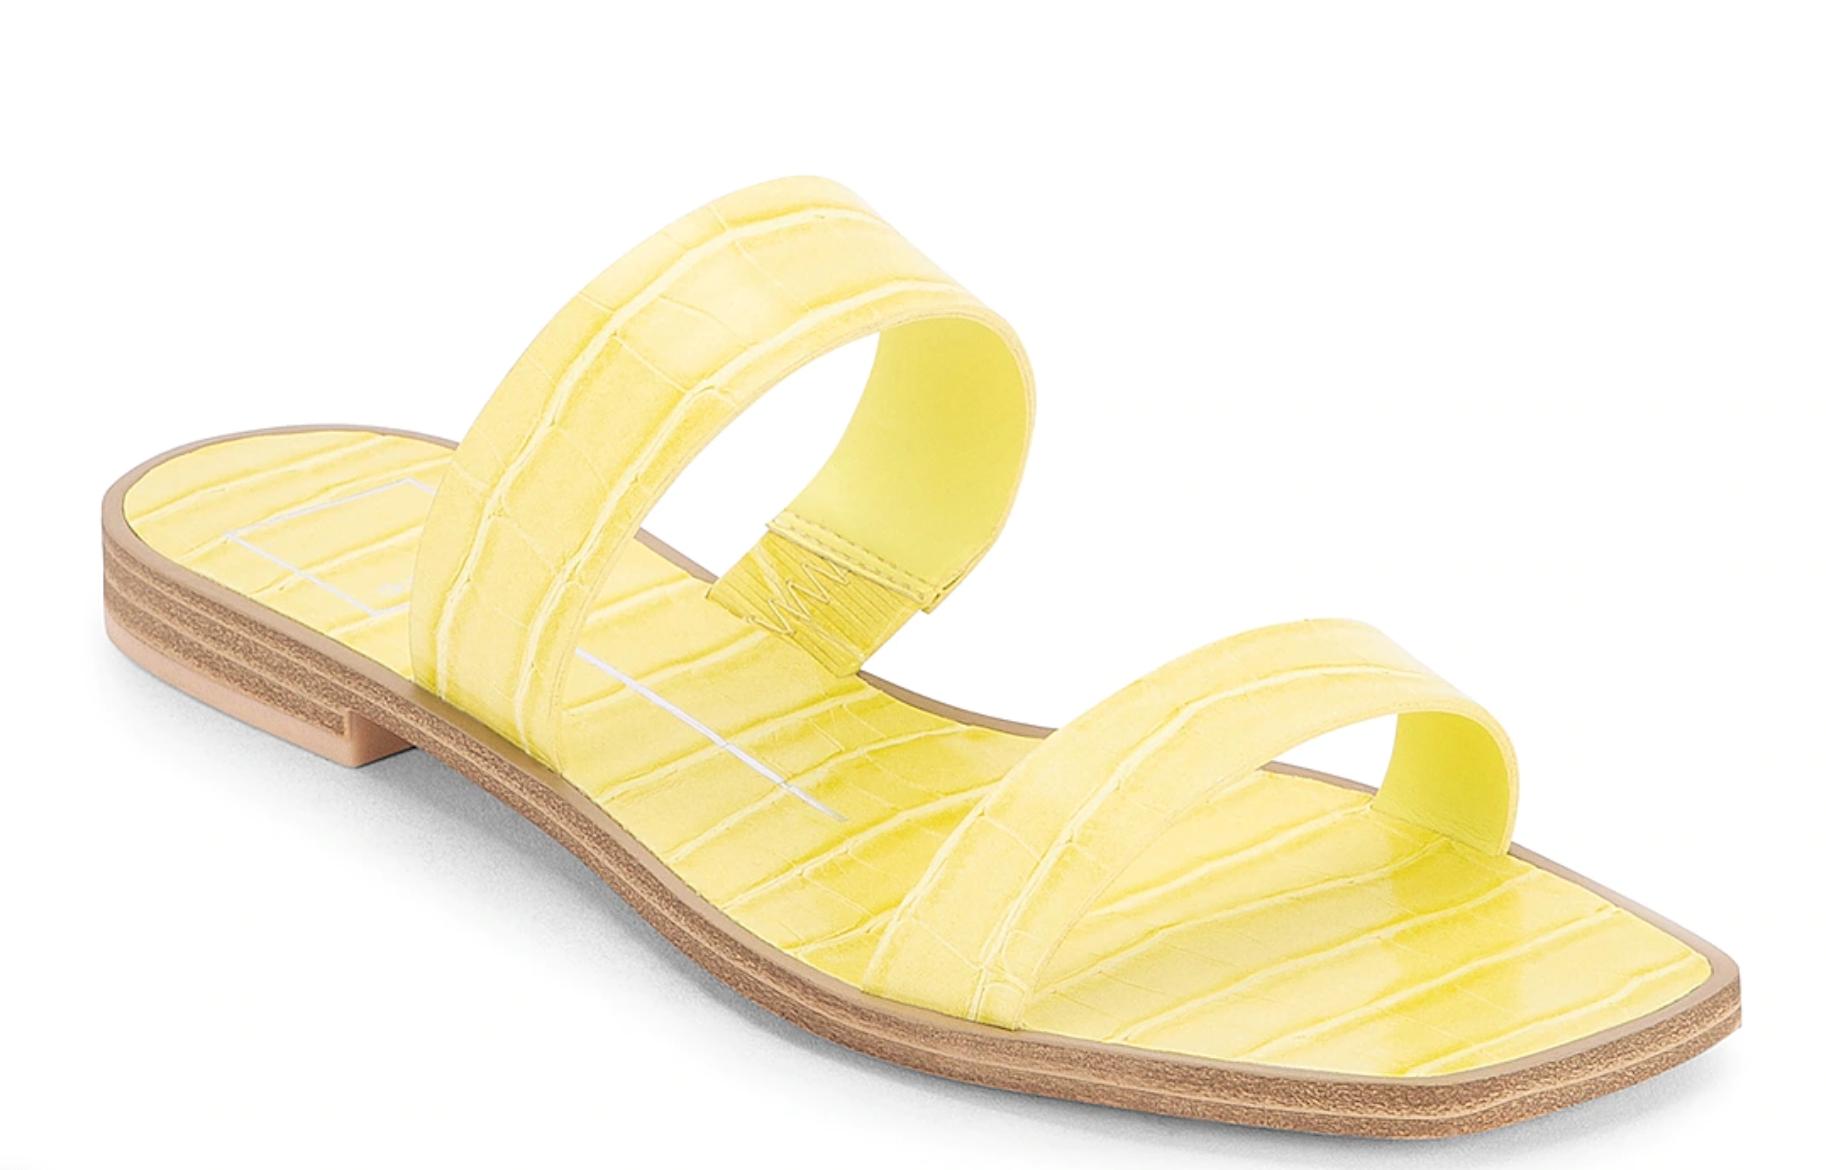 zapatos amarillos dolce vita